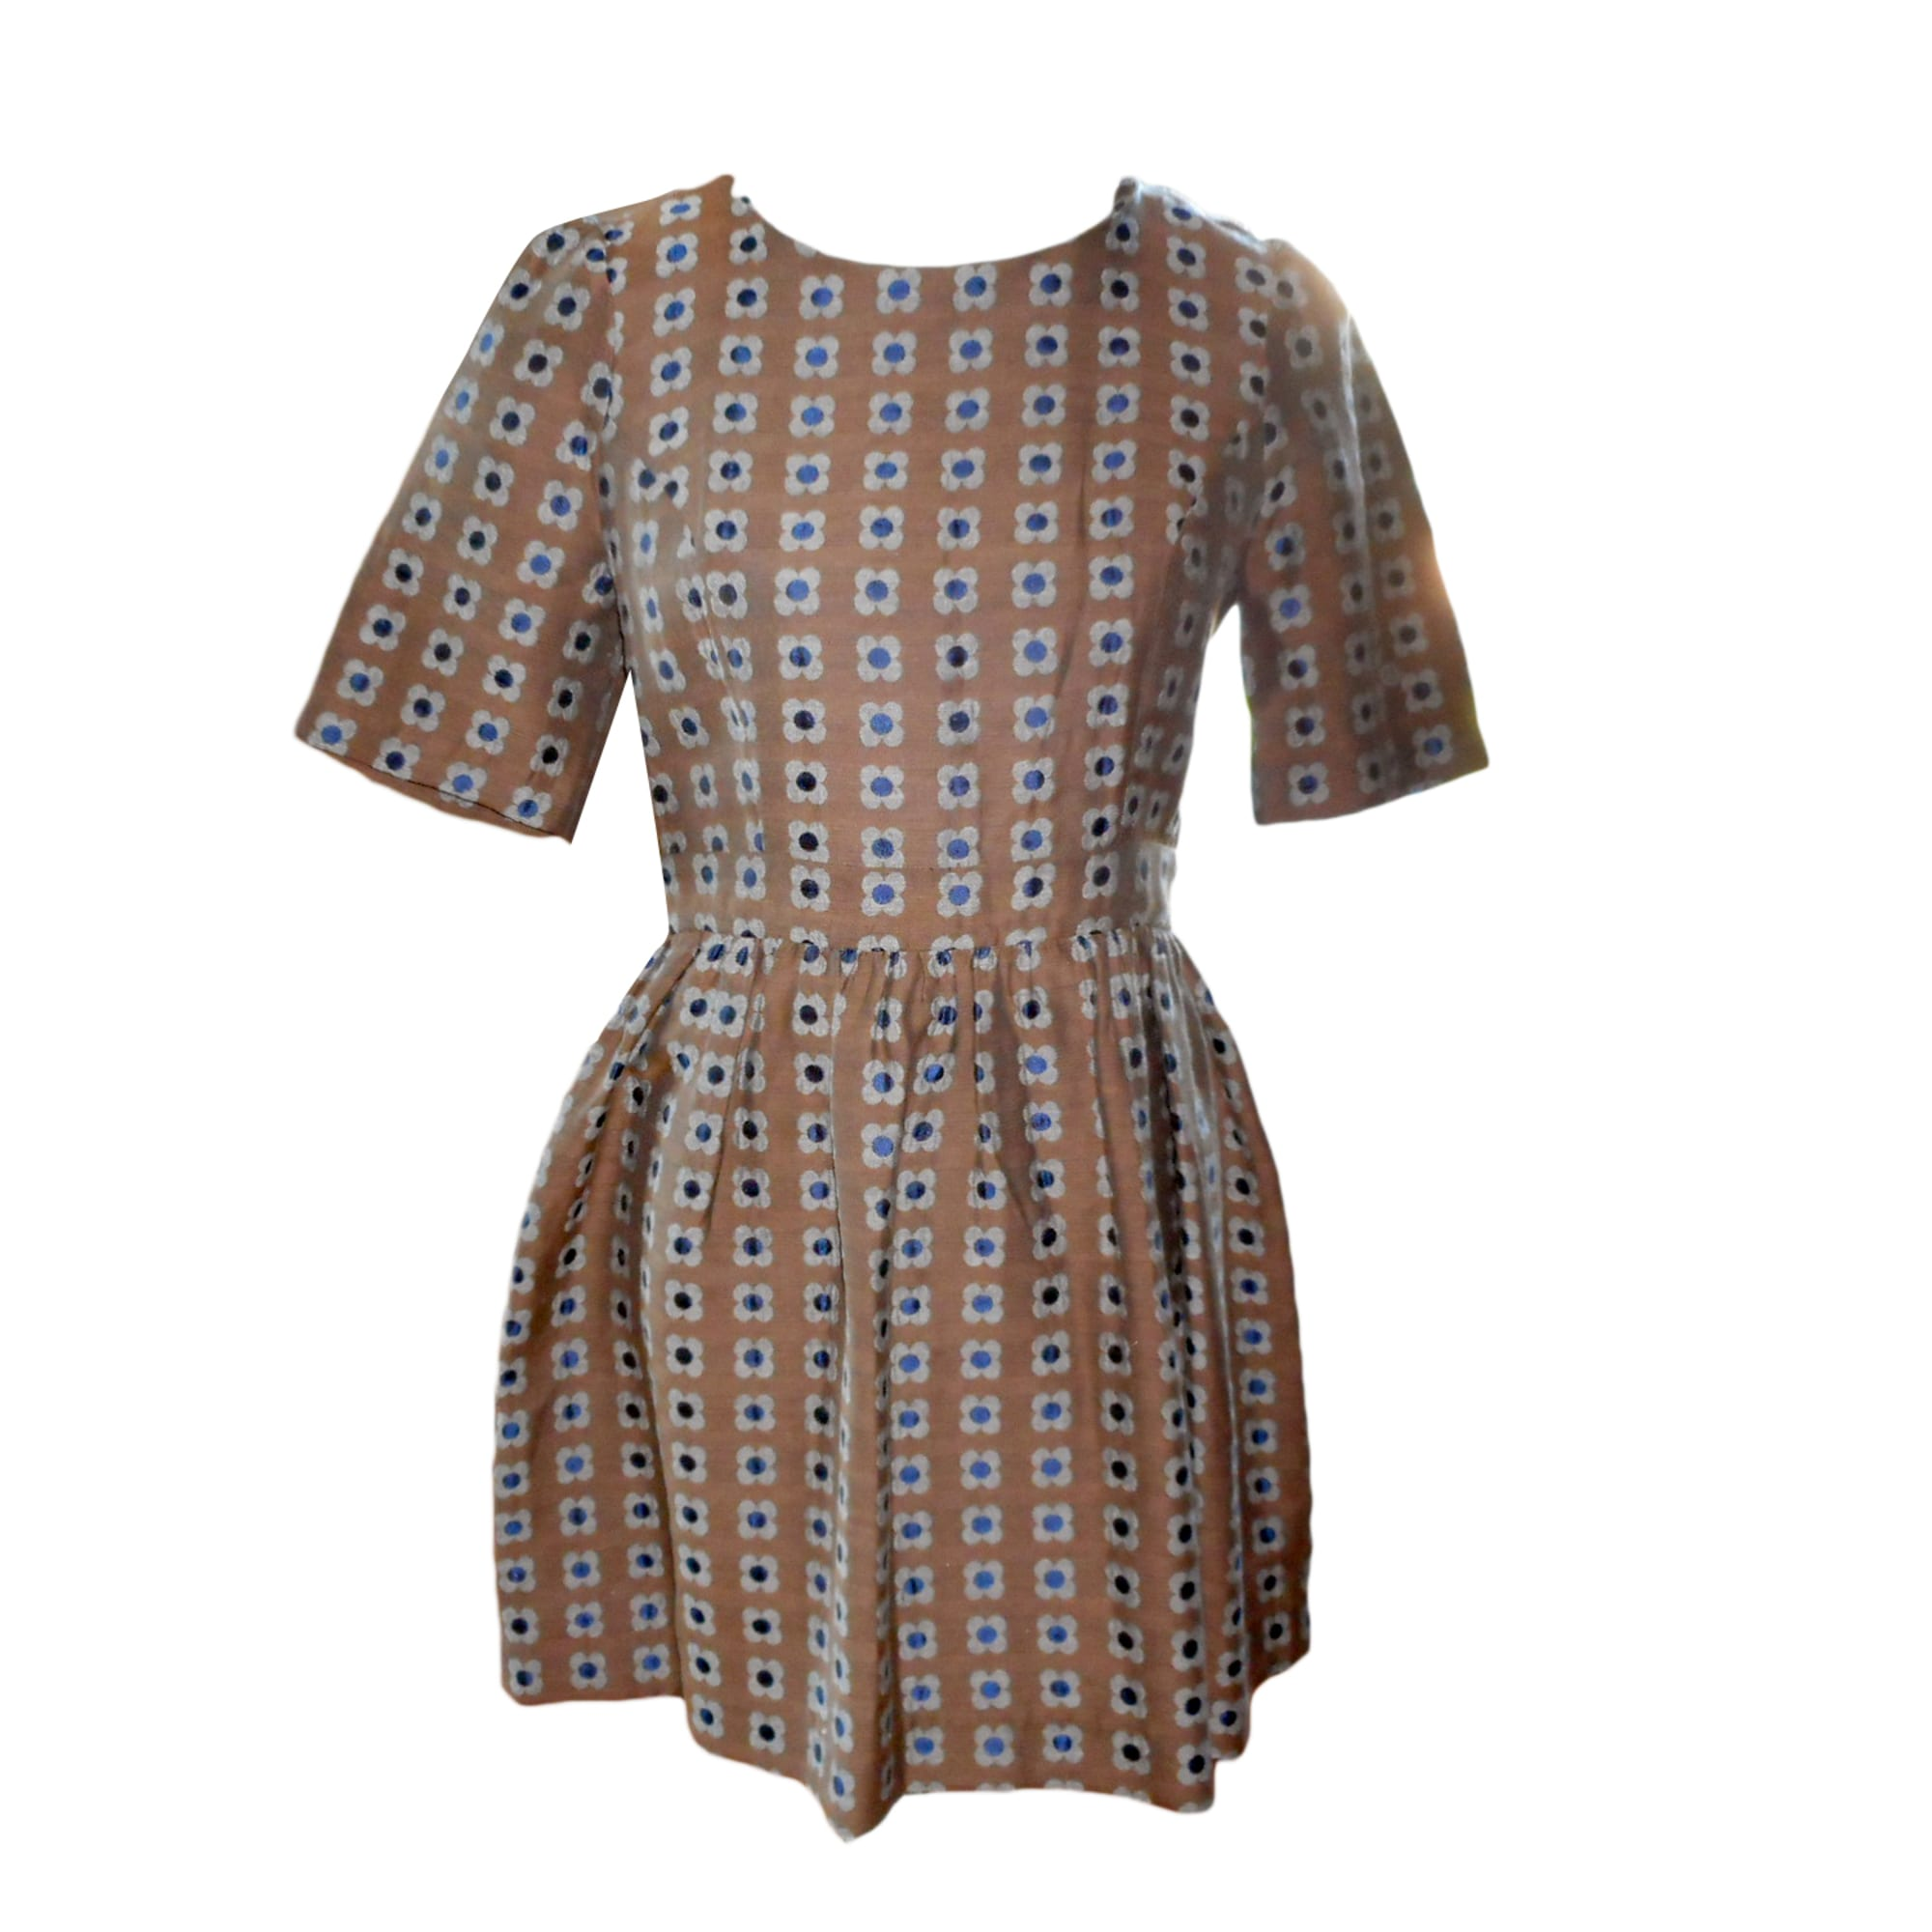 8fa131f666c Robe courte MADEMOISELLE TARA BY TARA JARMON 40 (L